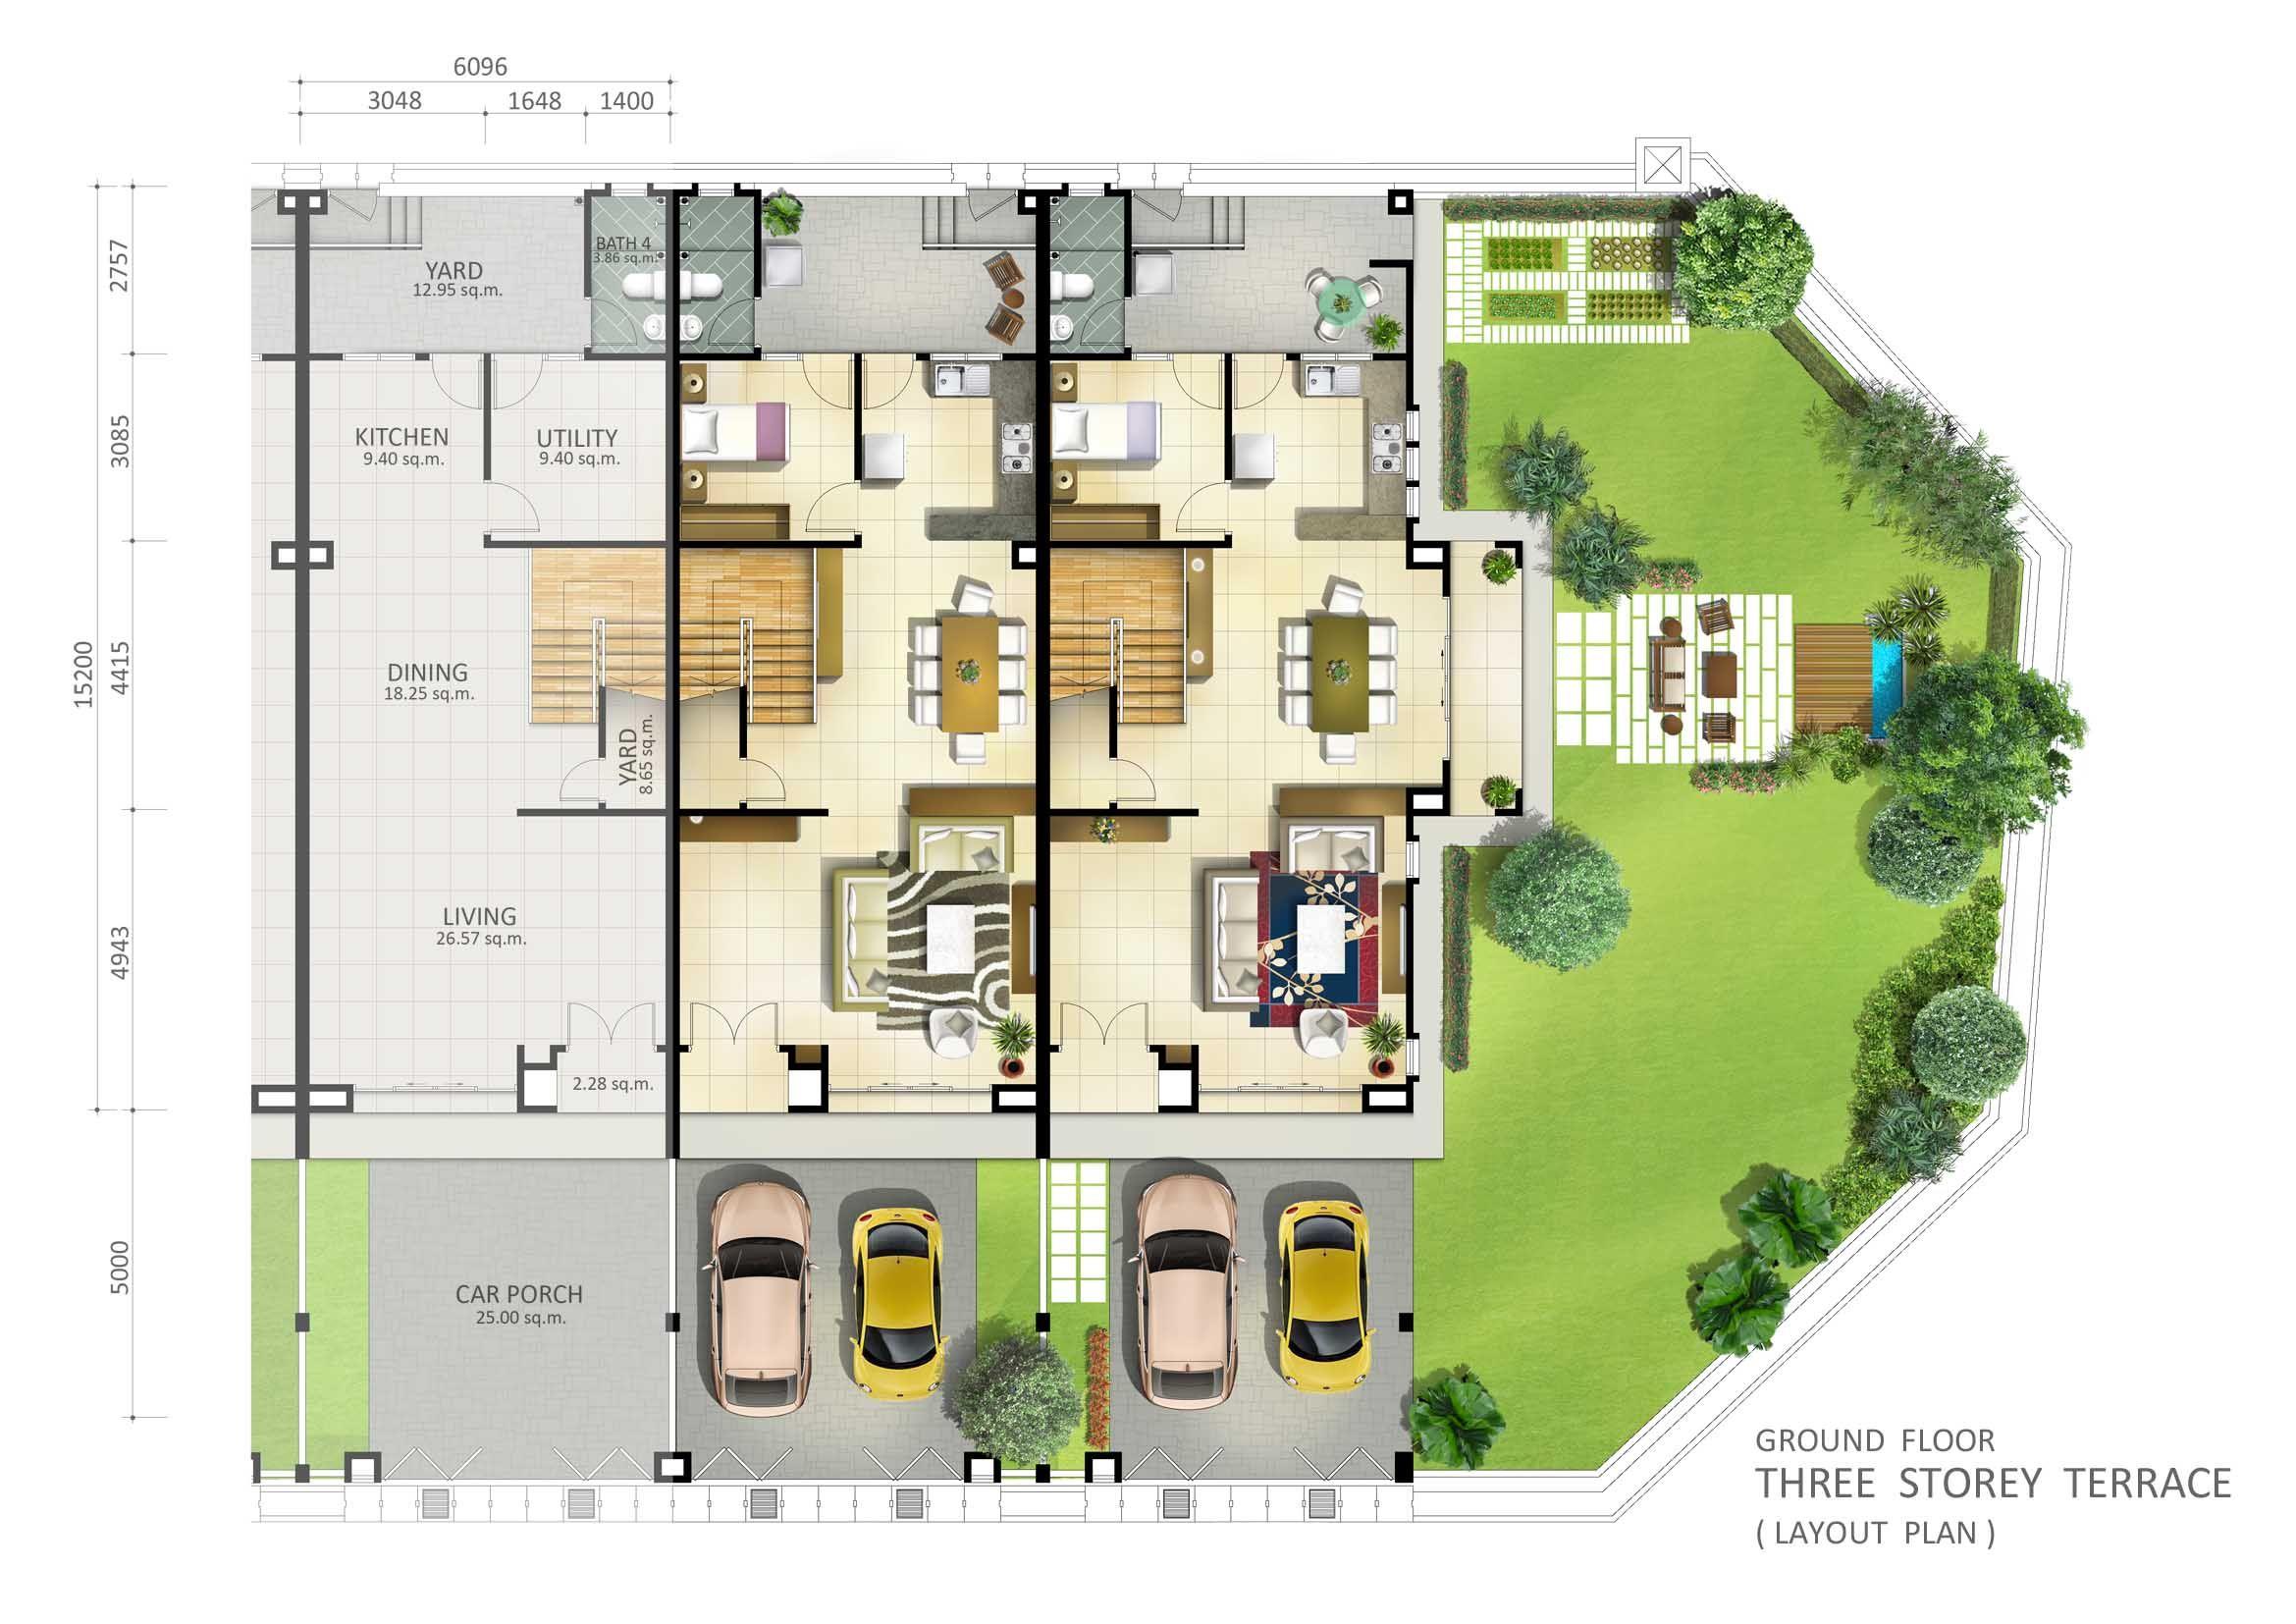 Marvelous 3 Storey Terrace Ground Floor Plan (2339×